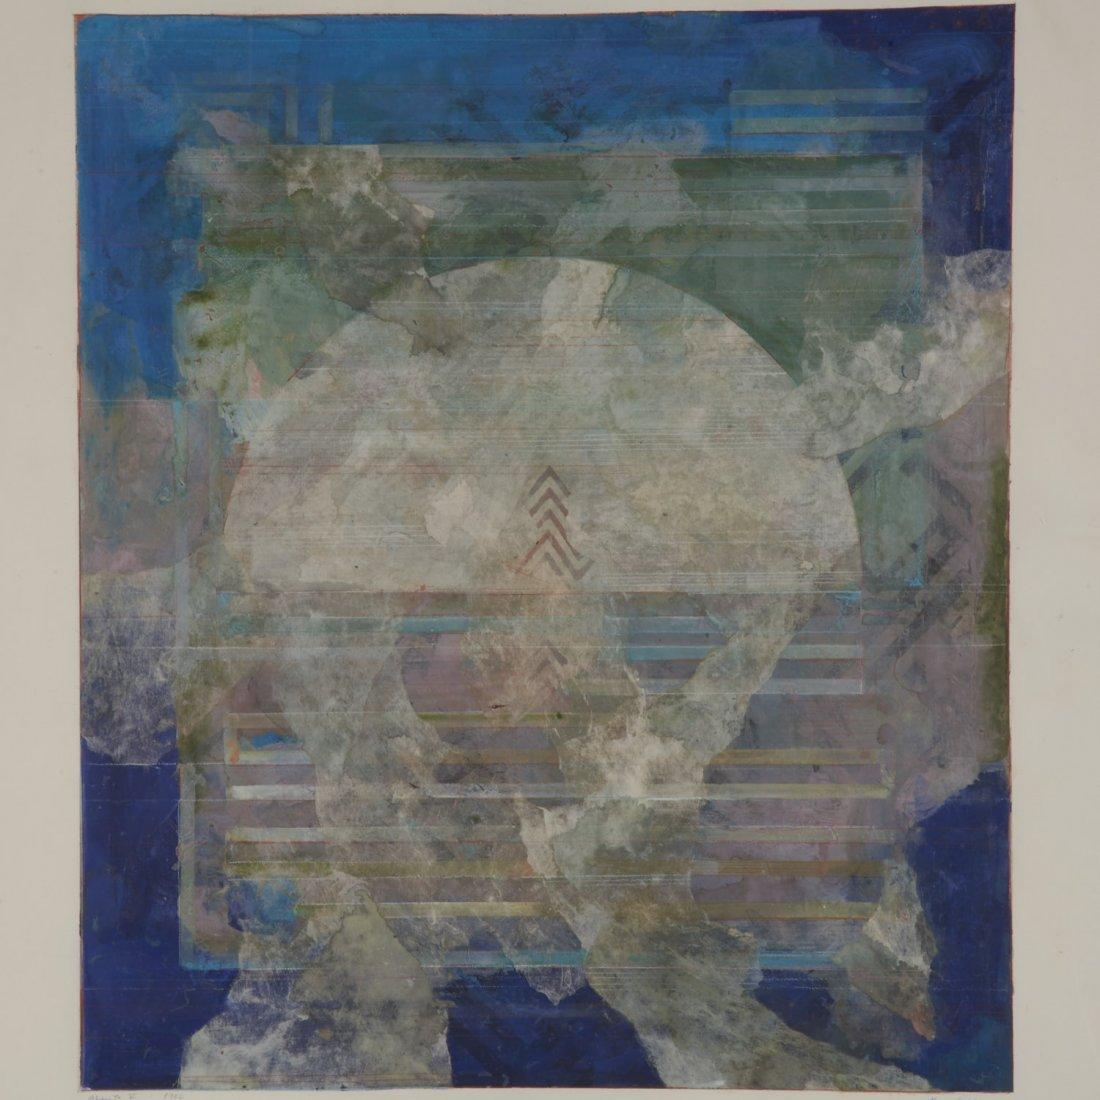 Robert Kelly, large collage monoprint - 2